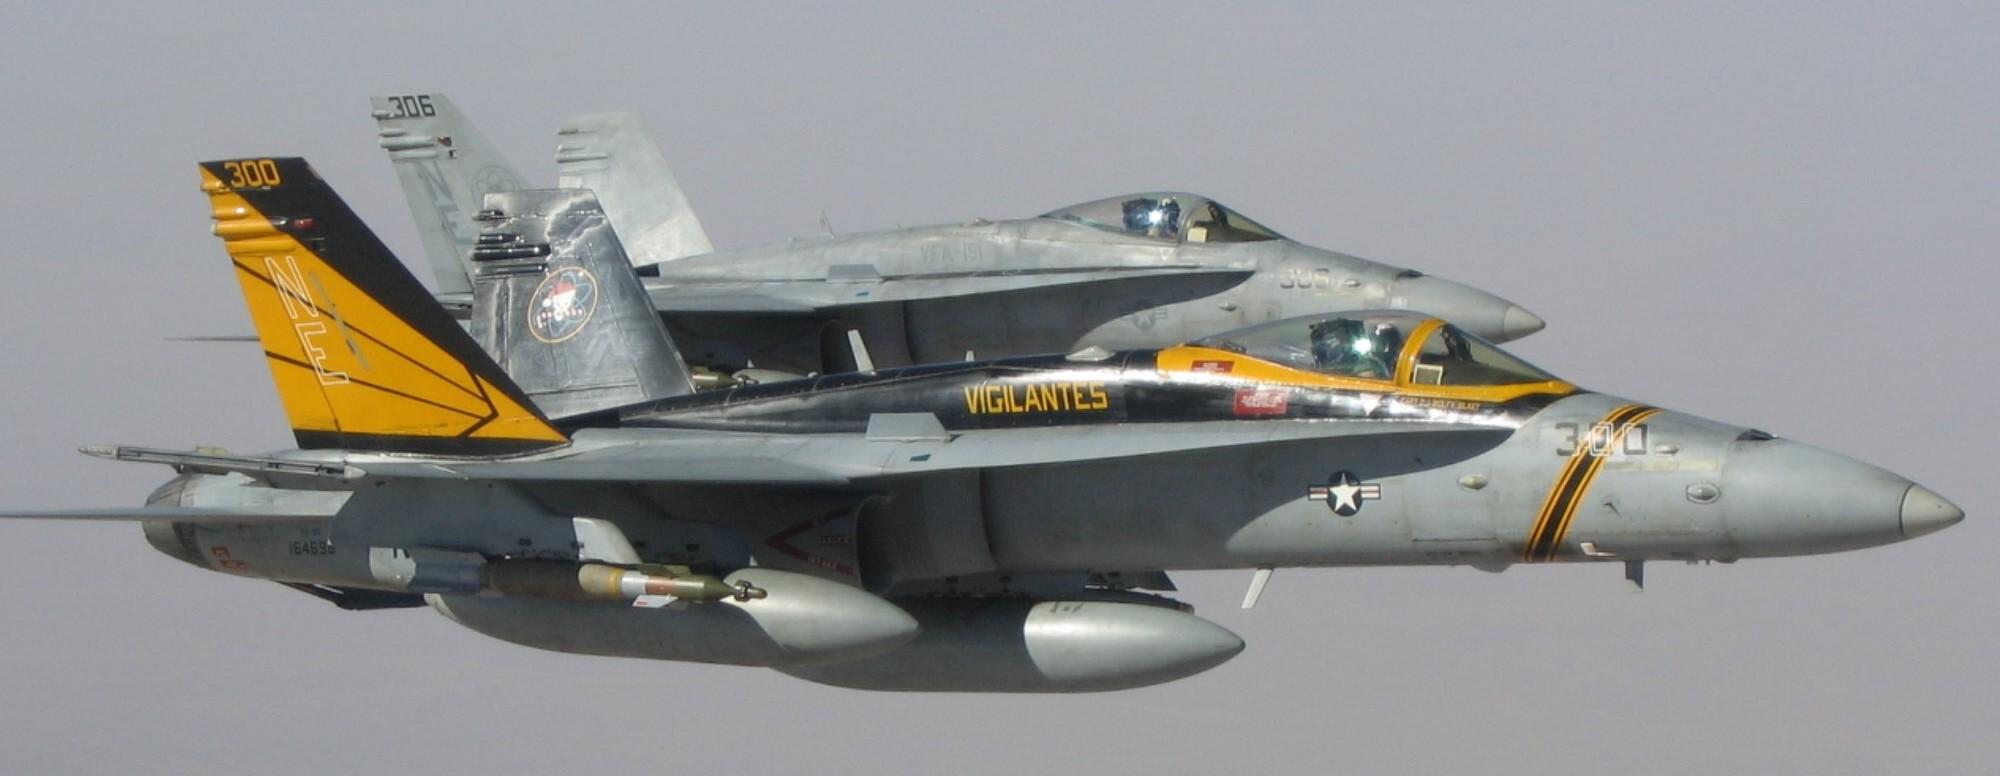 VFA-151-Vigilantes-087.jpg